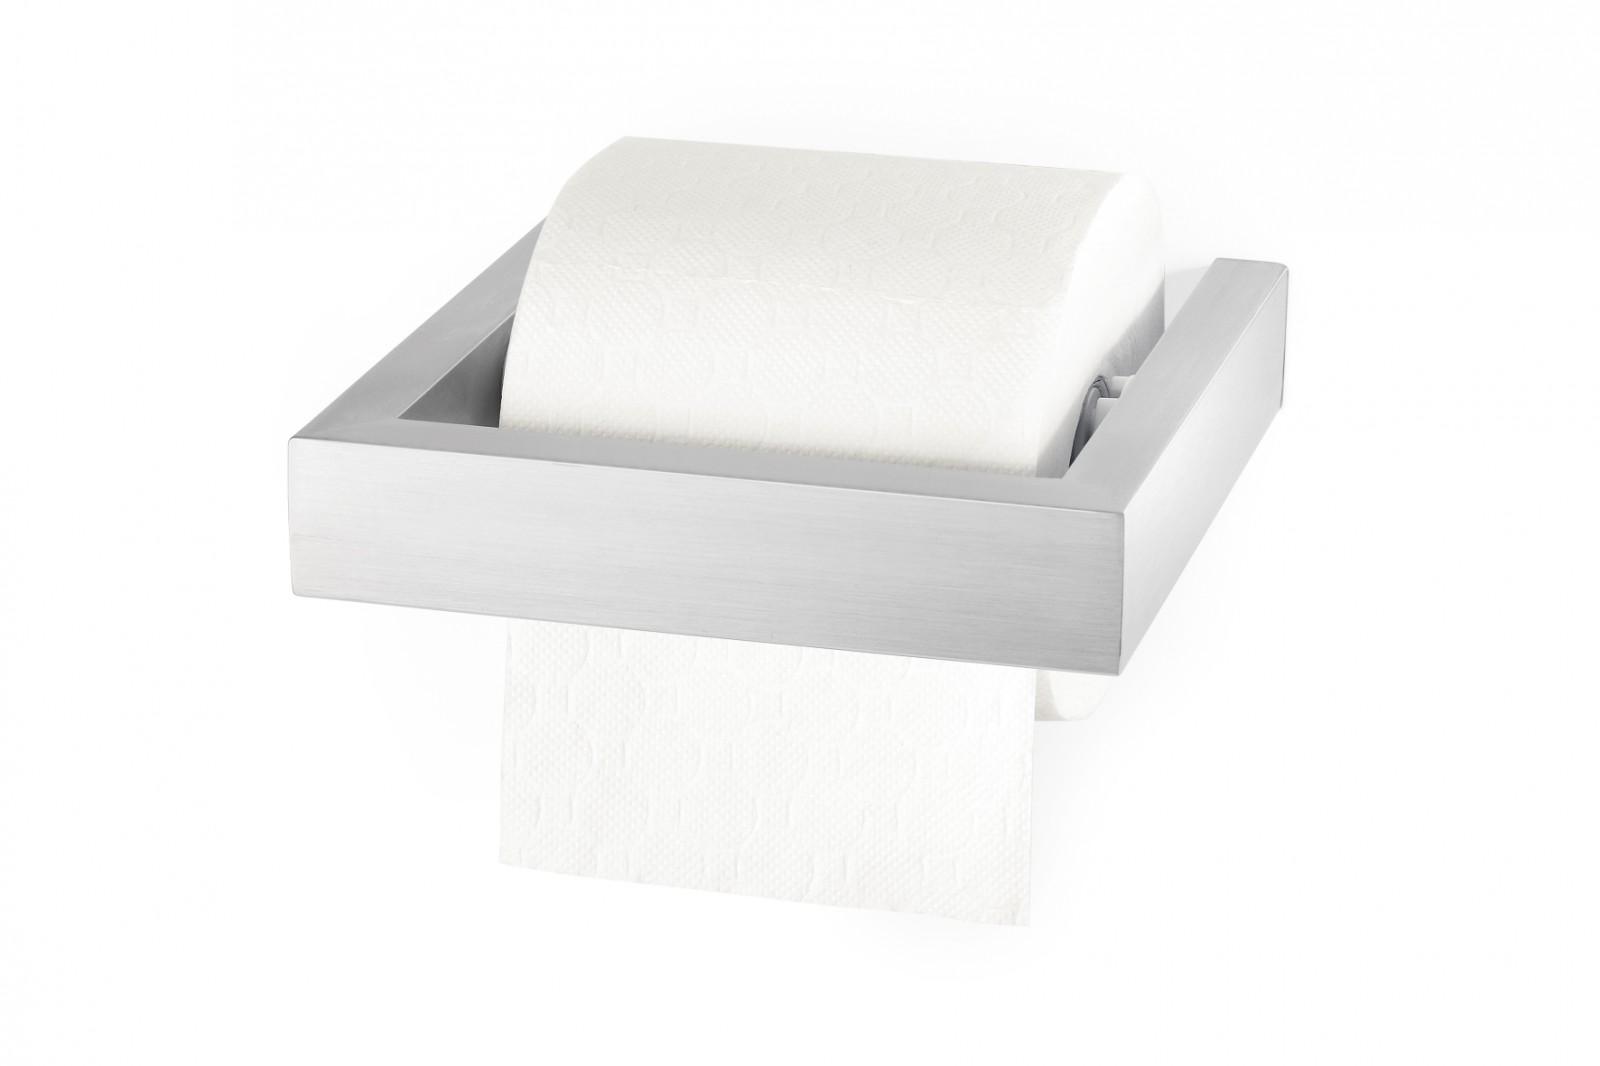 edelstahl toilettenpapierhalter linea wc rollenhalter zack 40386 bad bad edelstahl wc b rsten wc. Black Bedroom Furniture Sets. Home Design Ideas